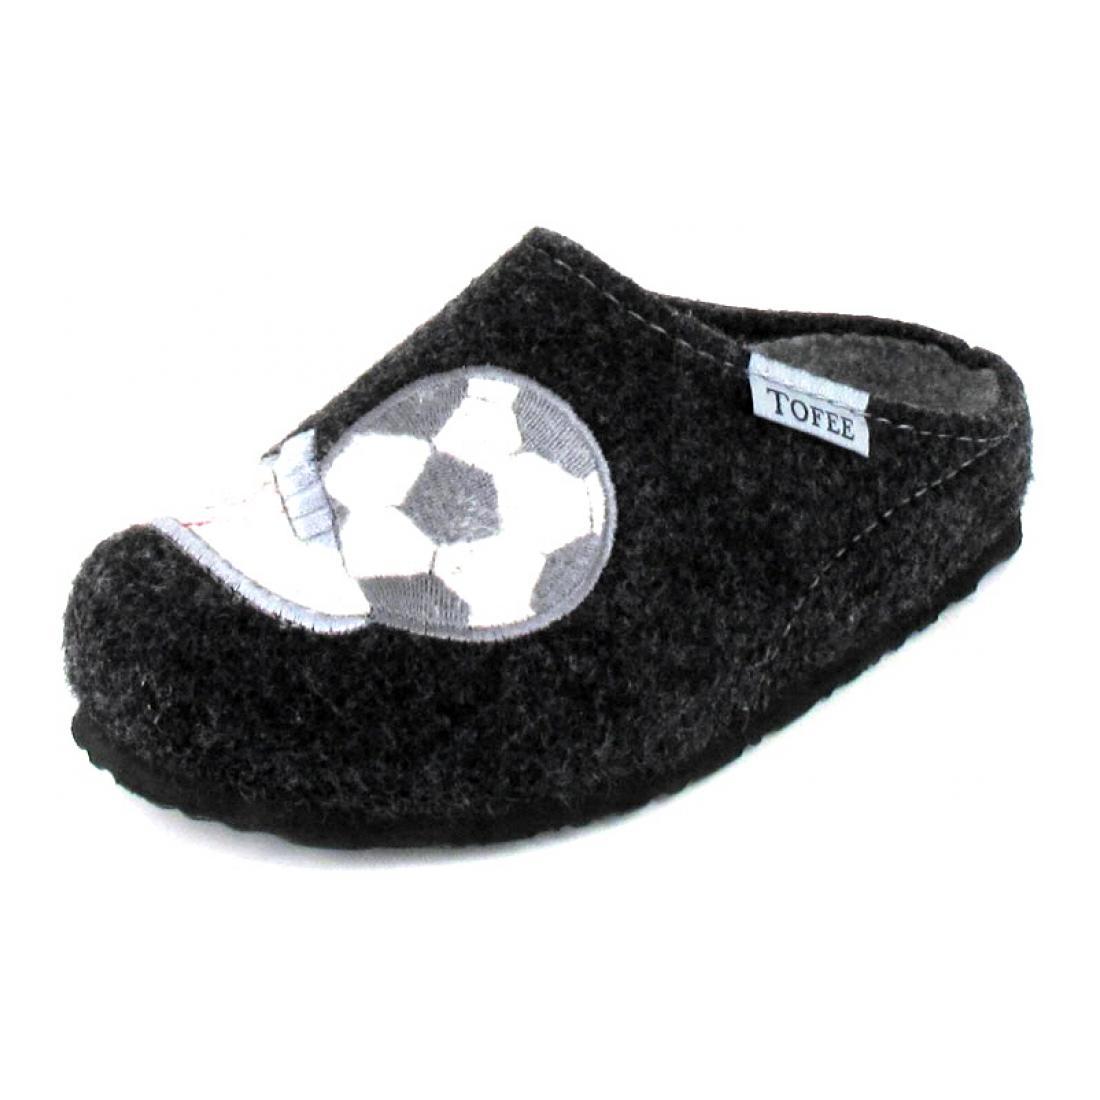 Tofee Hausschuh Fußball